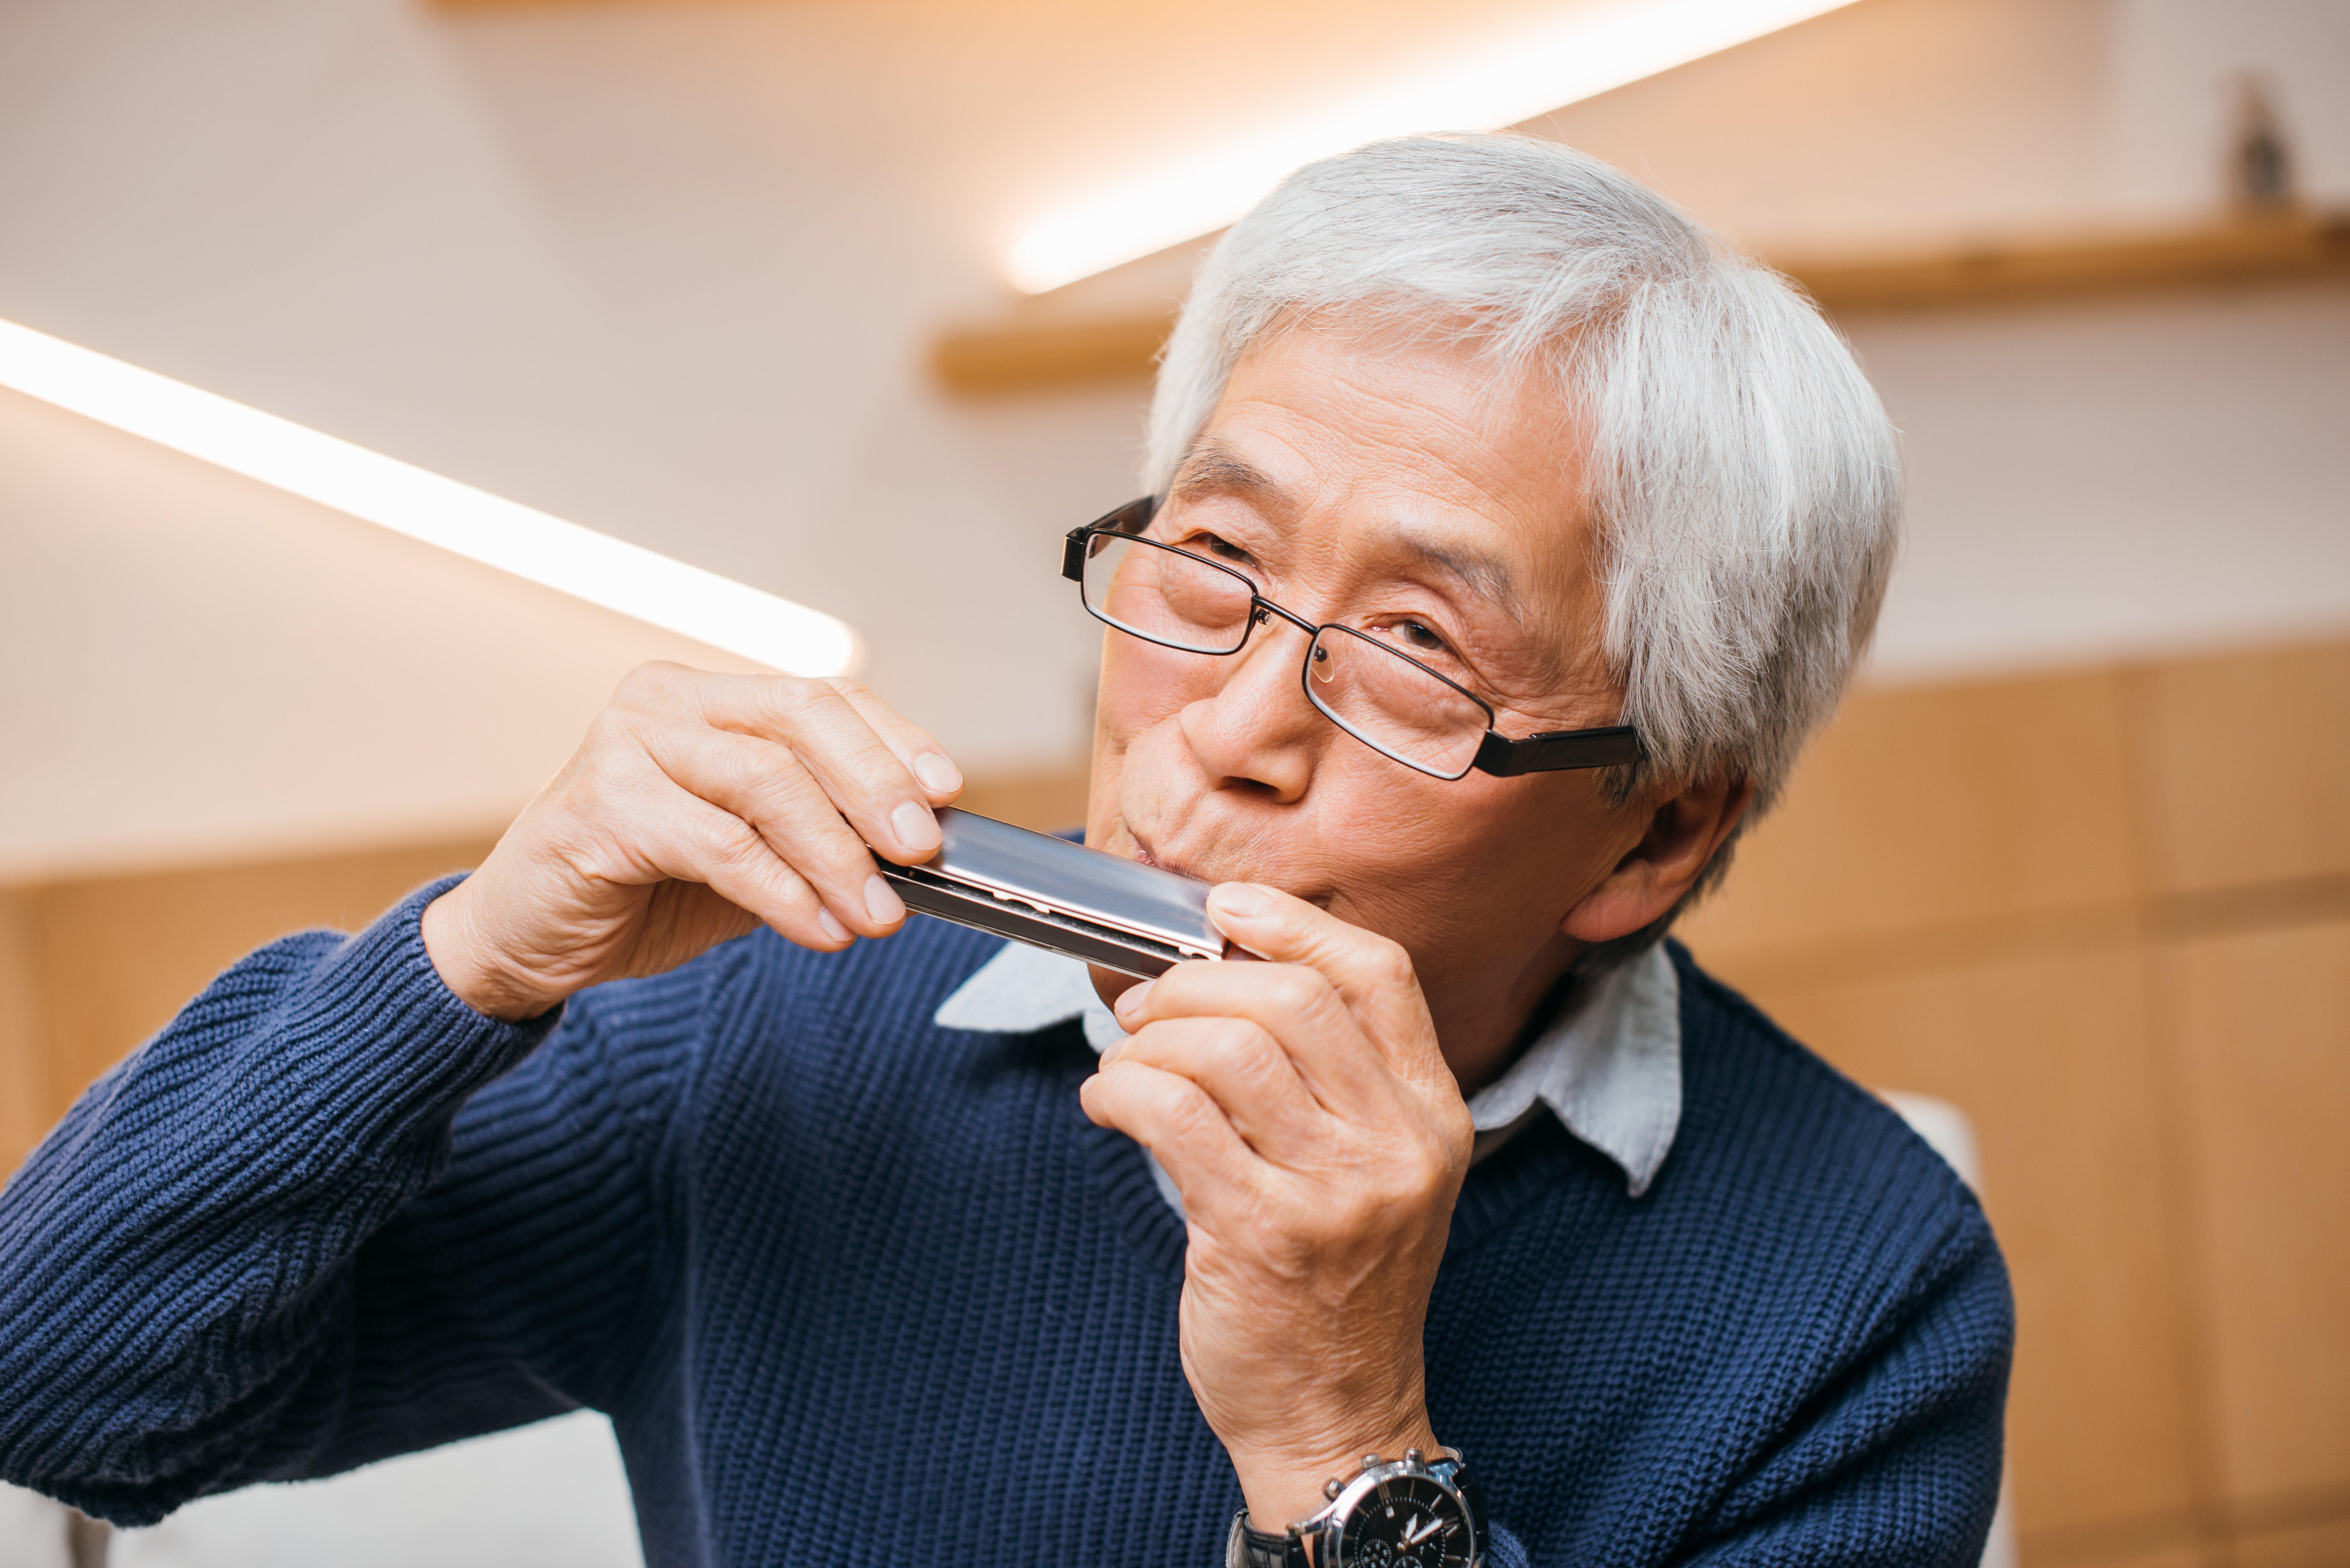 Harmonica older man